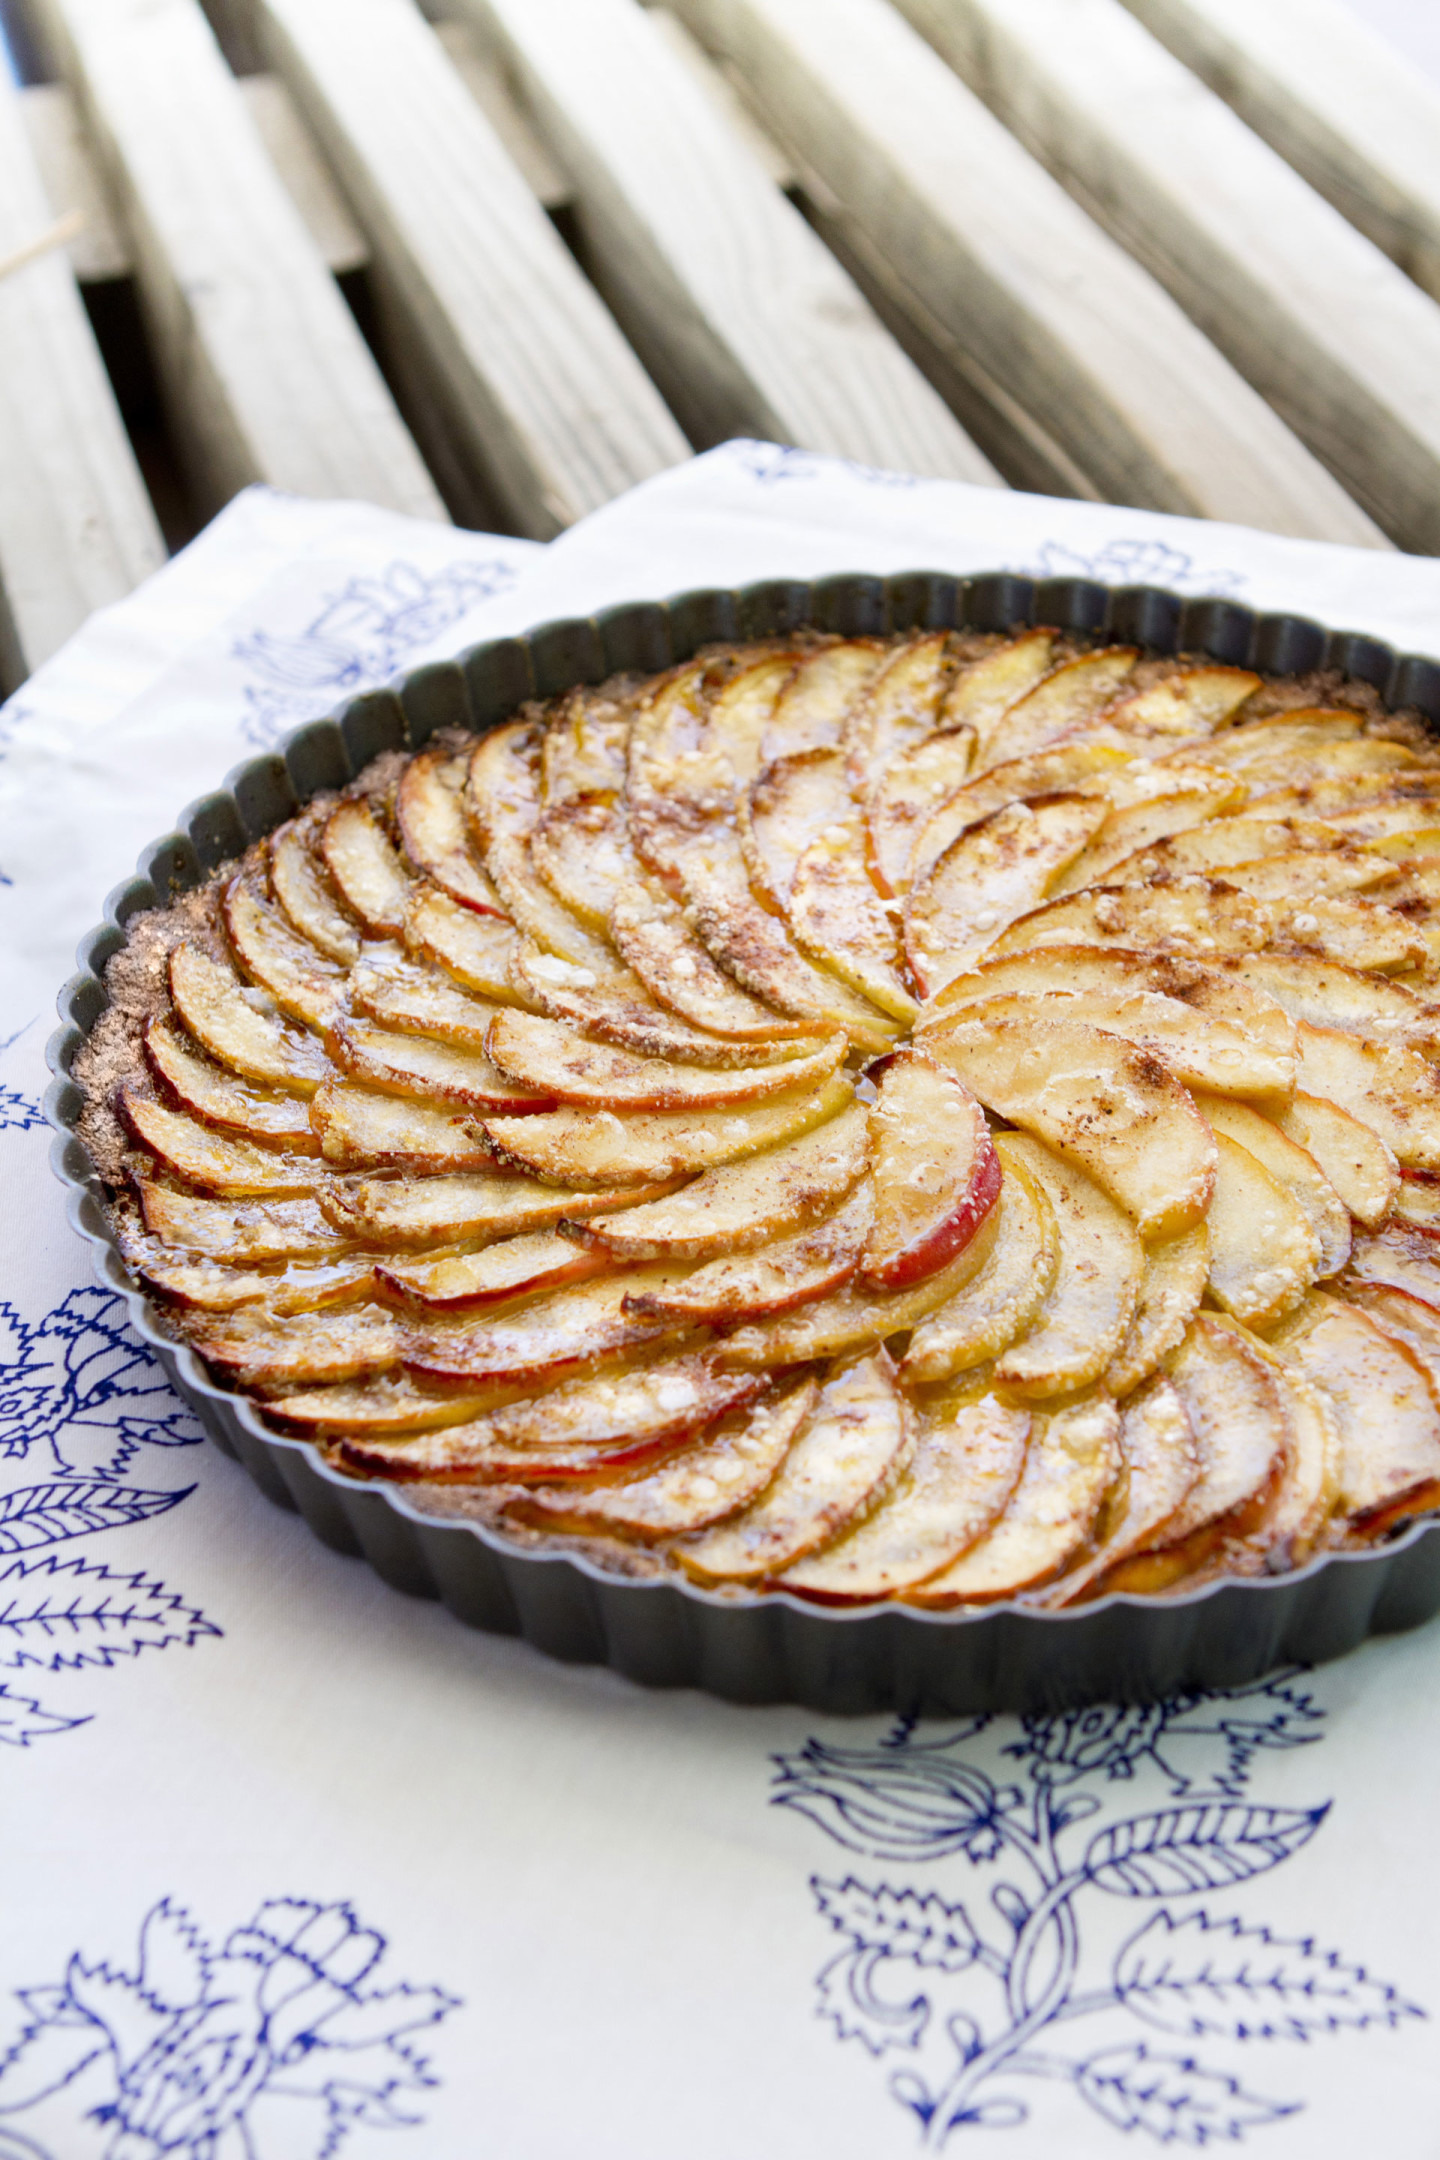 Vegan Apple Pie  The Plantpower Way to a Vegan Diet for the 21st Century